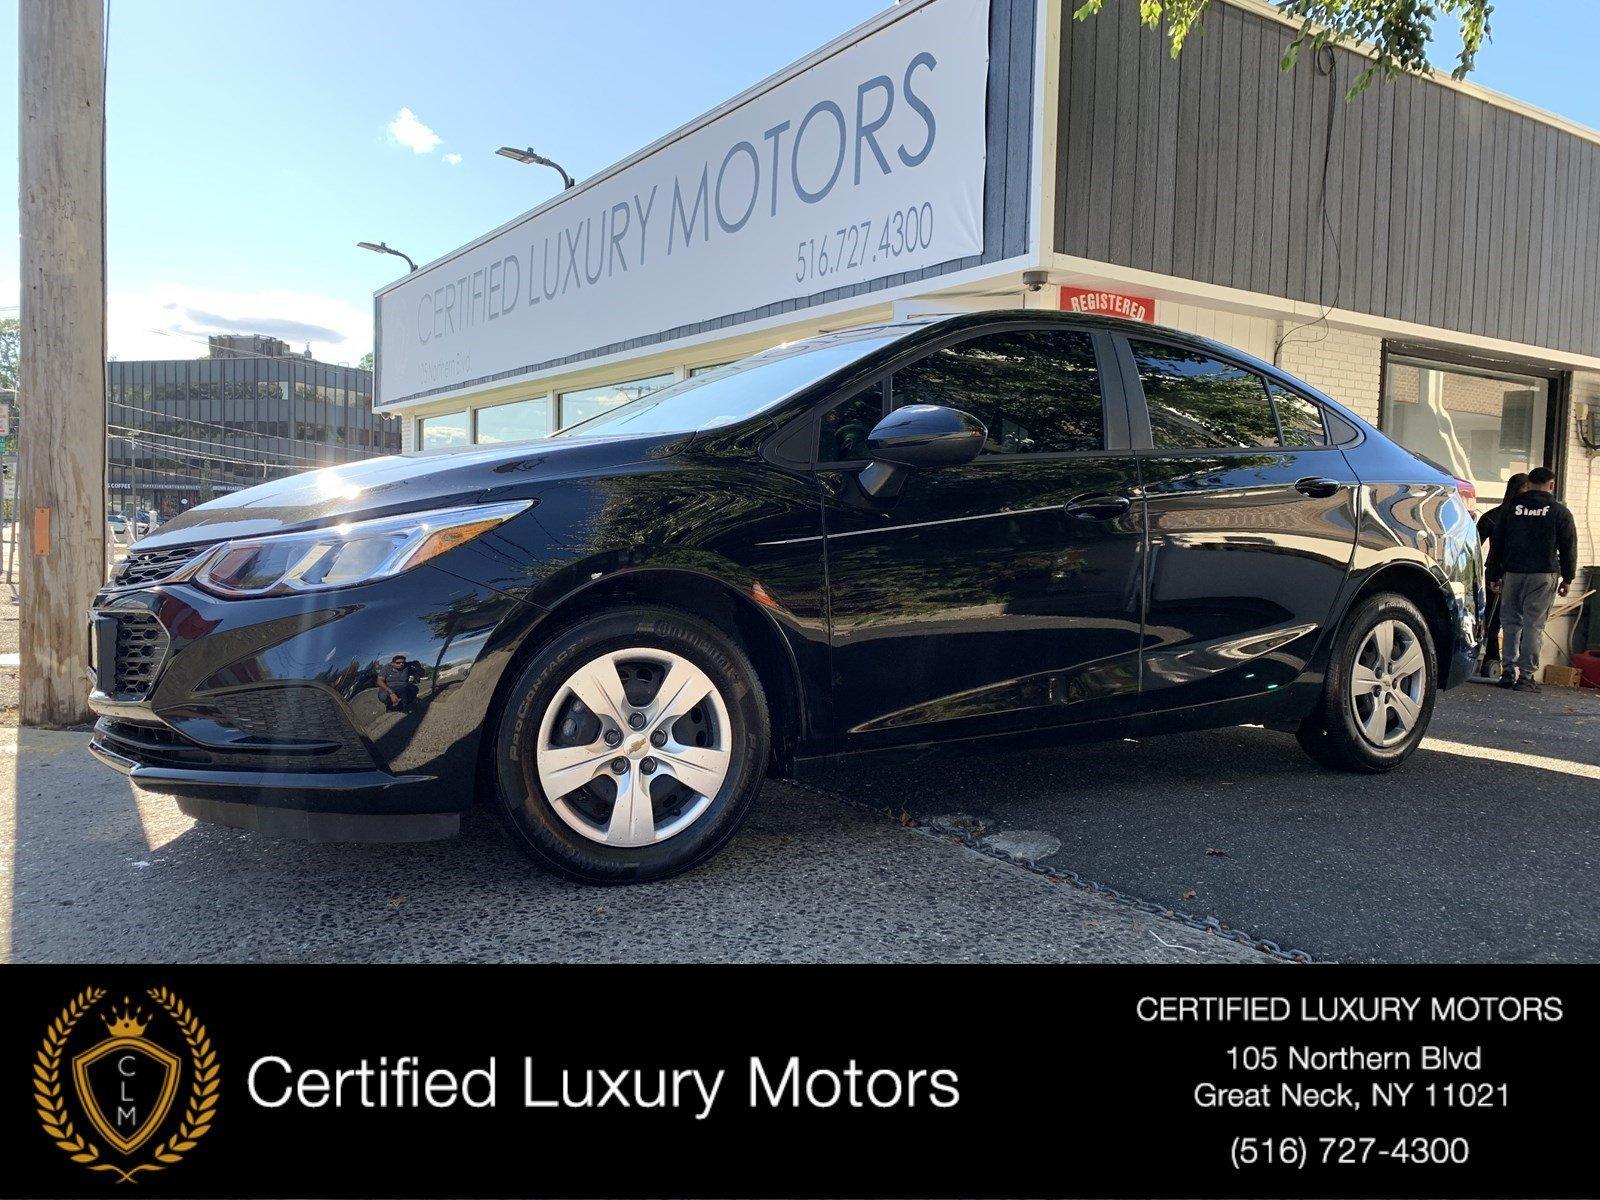 Northern Neck Chevrolet >> 2018 Chevrolet Cruze LS Stock # vvT3758 for sale near ...